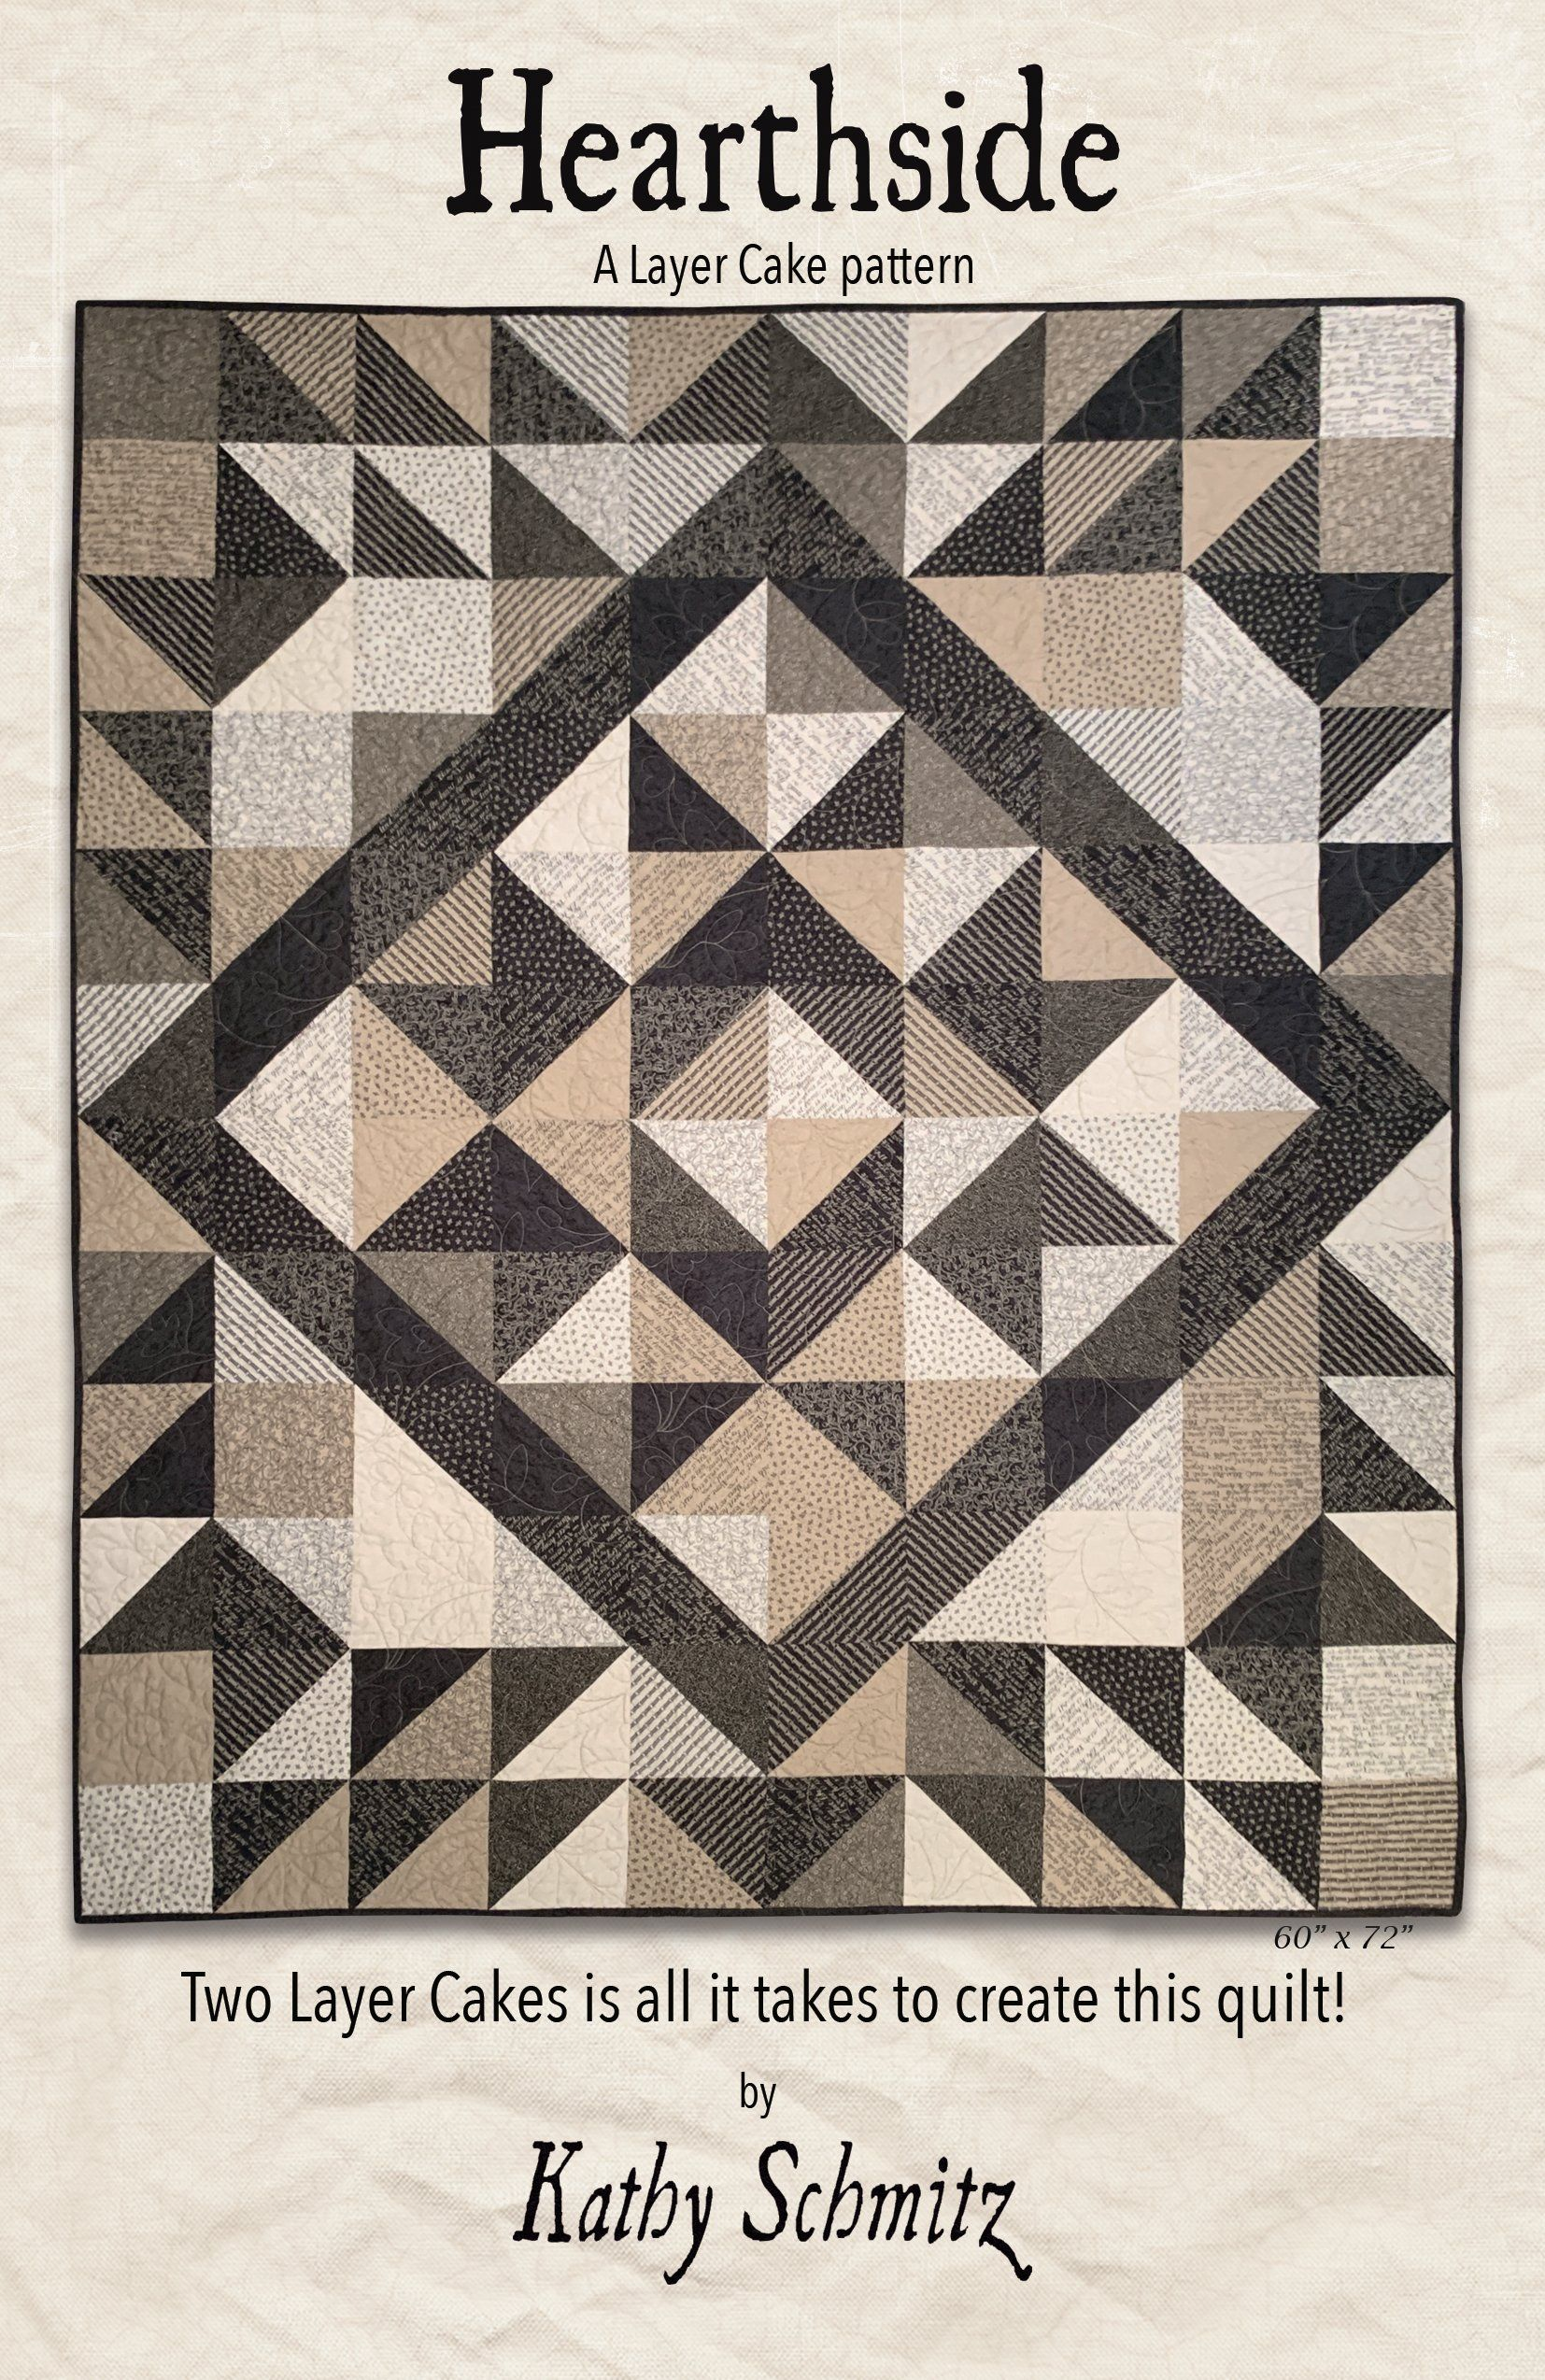 Hearthside Quilt pattern